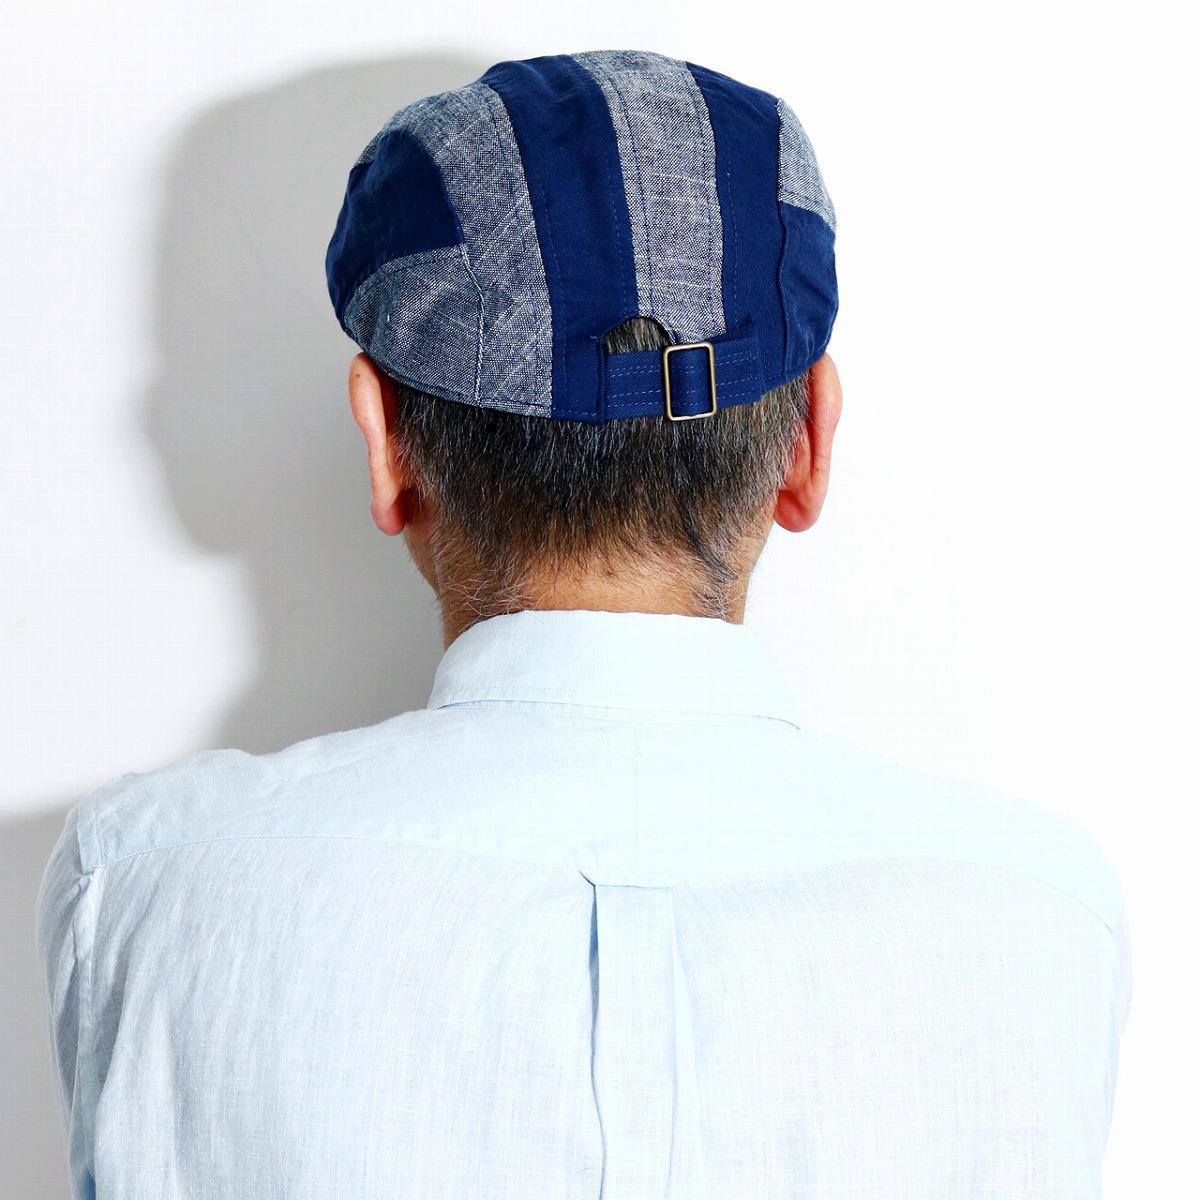 bd9d3f320 ruben hunting cap stripe men Rouben hunting cap hat saliva long chambray  linen hat 58.5cm RUBEN hunting cap hat gentleman hemp unisex size  adjustment ...